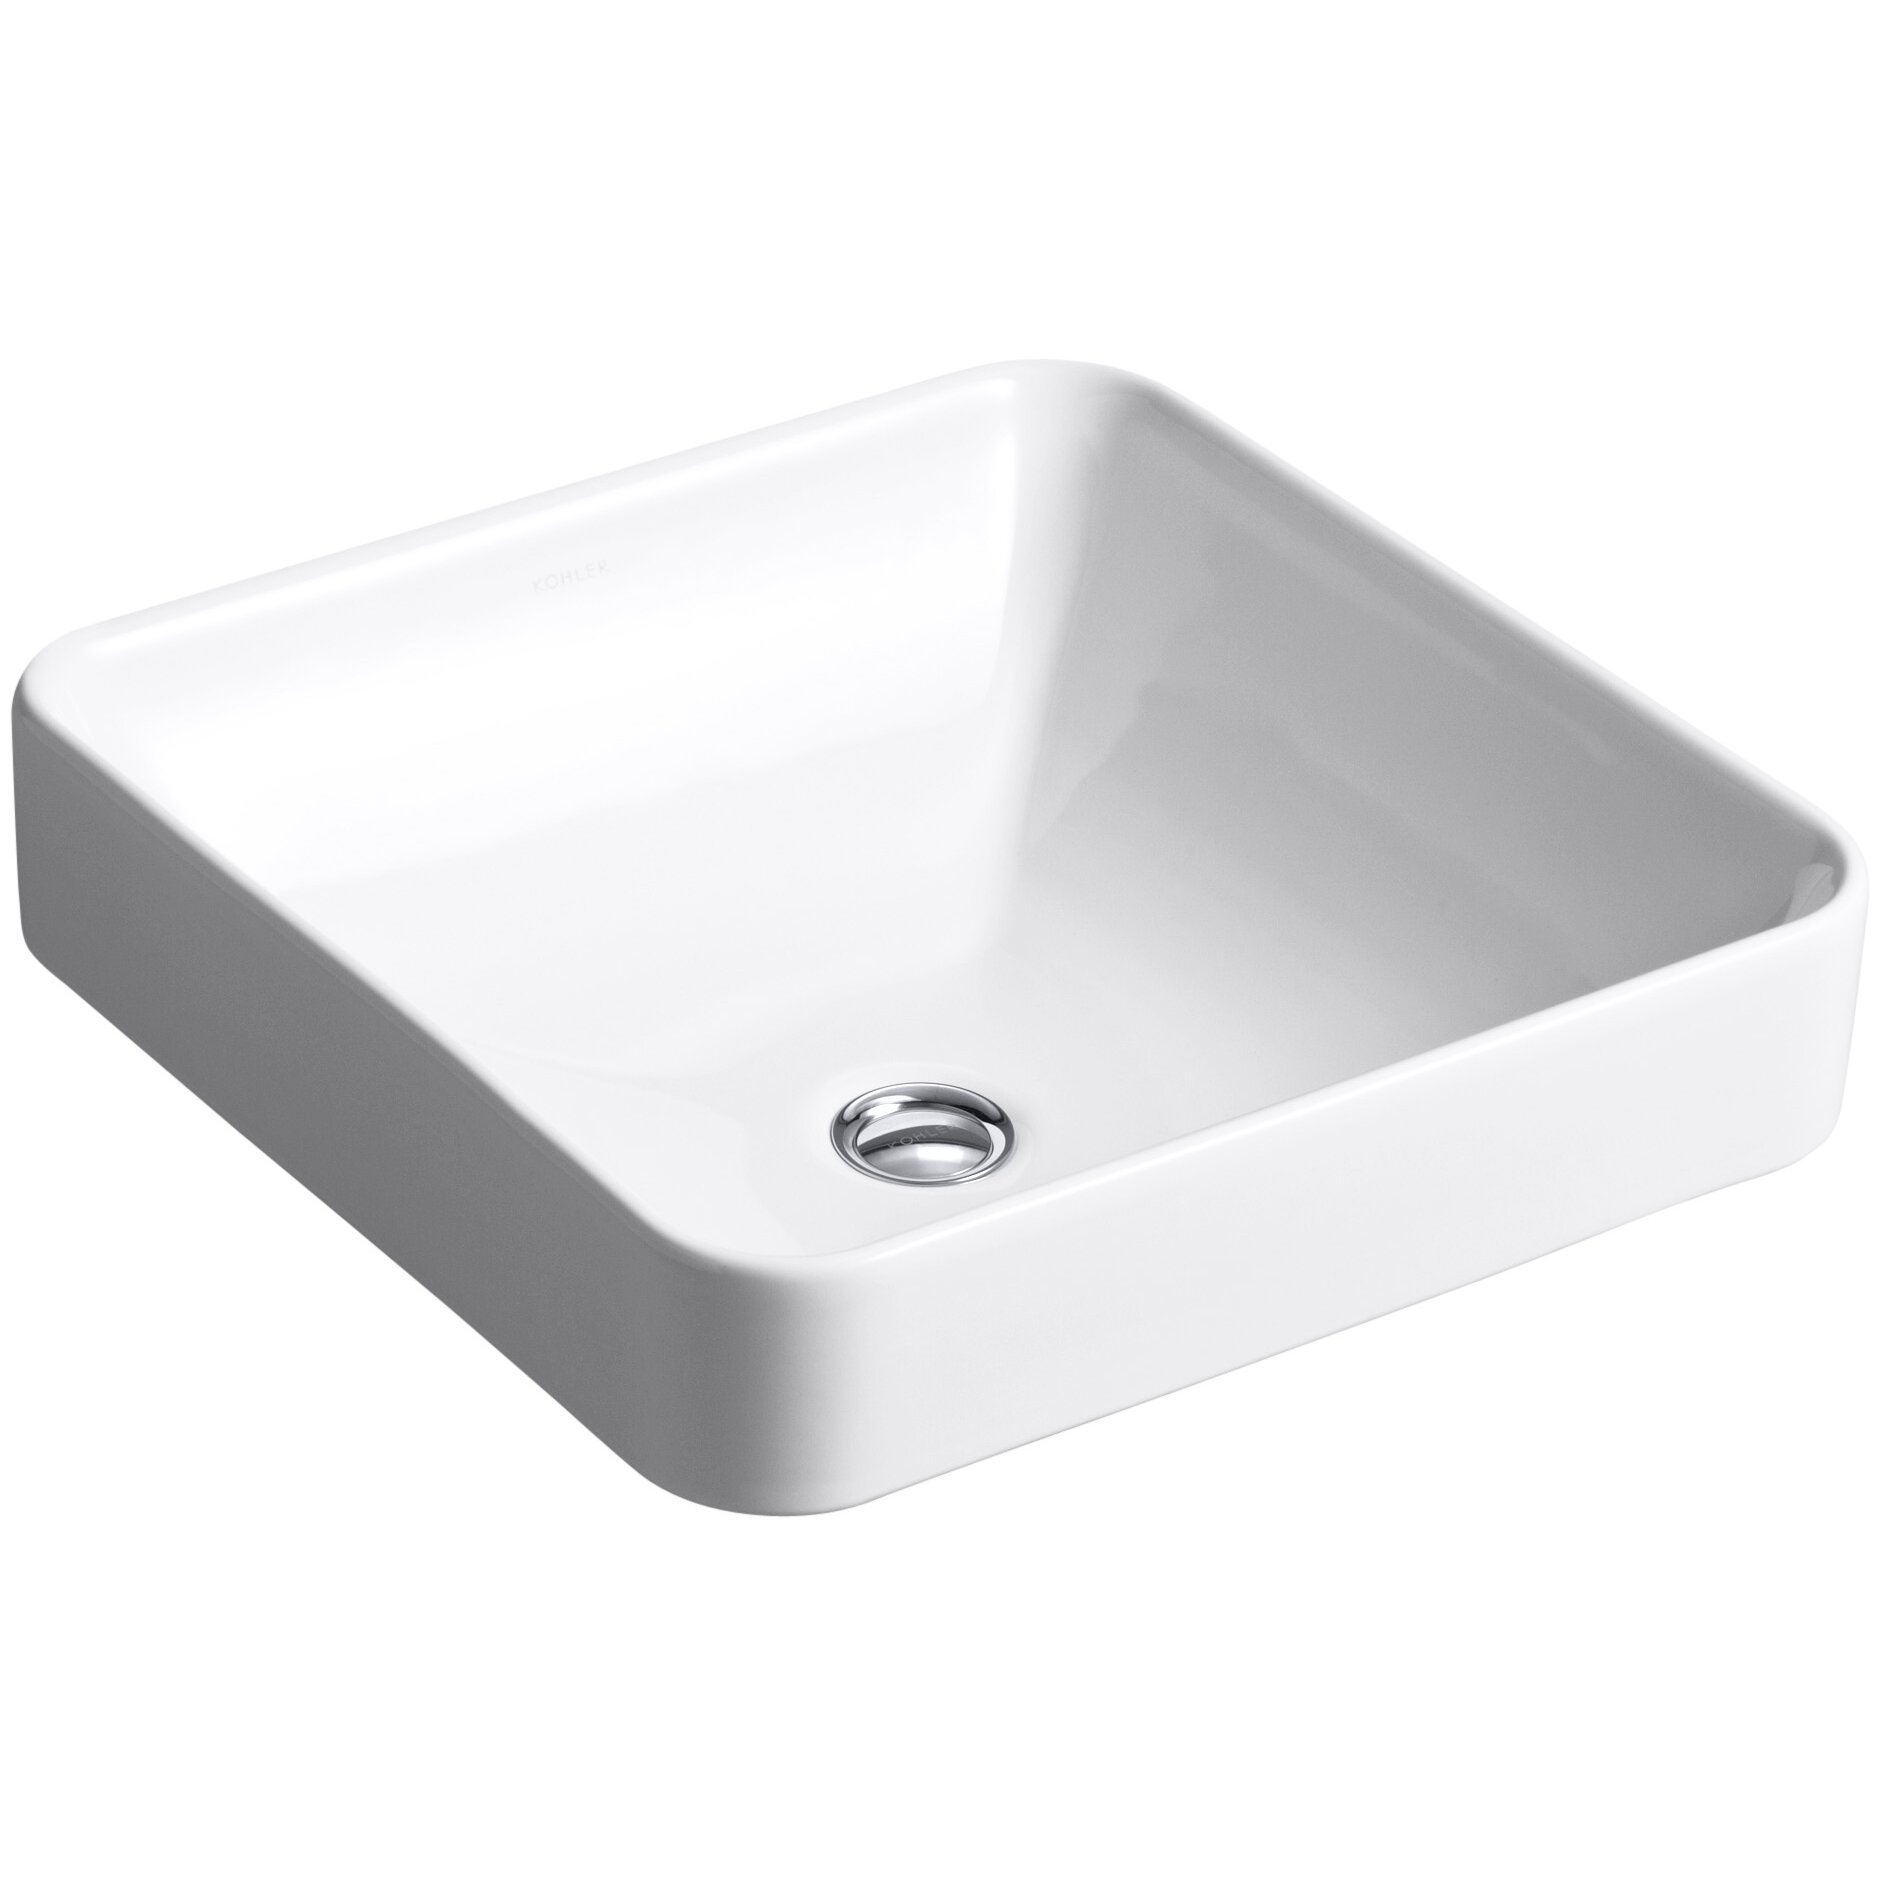 Bathroom square vessel sinks - Vox Square Vessel Bathroom Sink